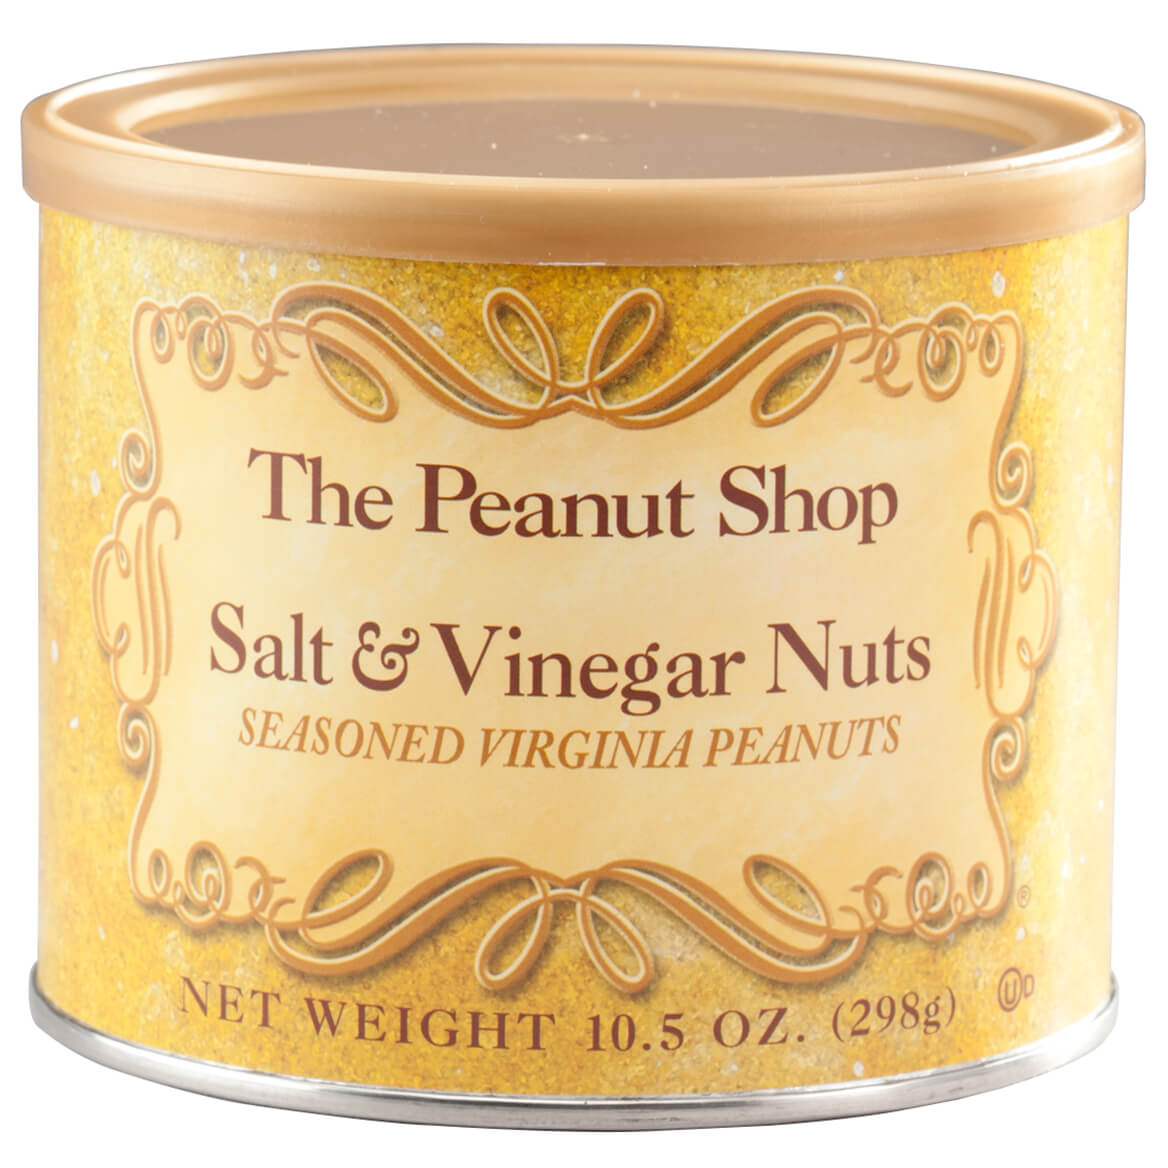 The Peanut Shop® Salt & Vinegar Peanuts, 10.5 oz.